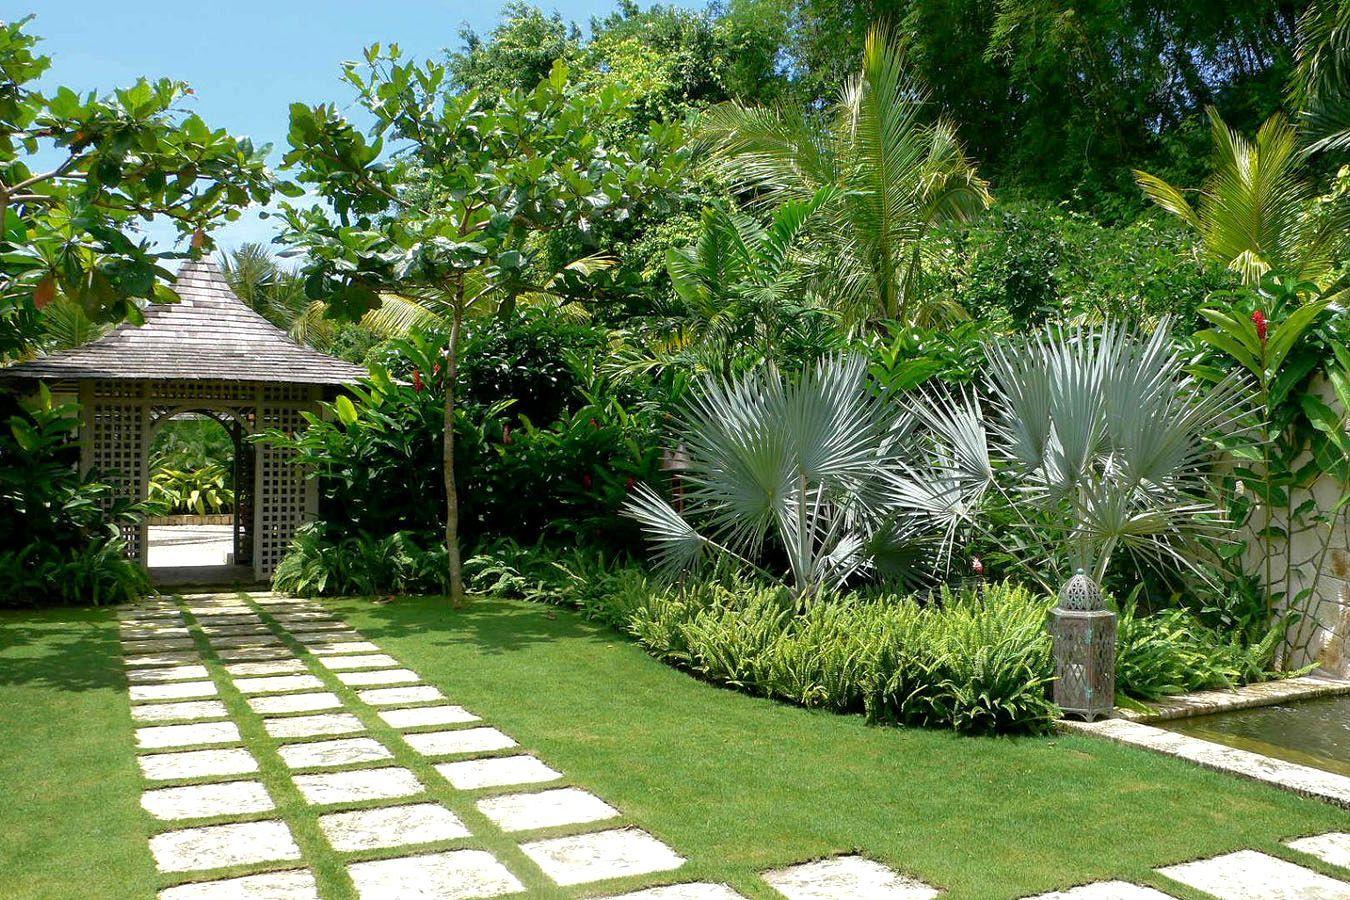 Home Garden Design Ideas Home Garden Design Ideas Kitchen The Garden Inspirations Tropical Garden Design Outdoor Gardens Design Garden Design Pictures